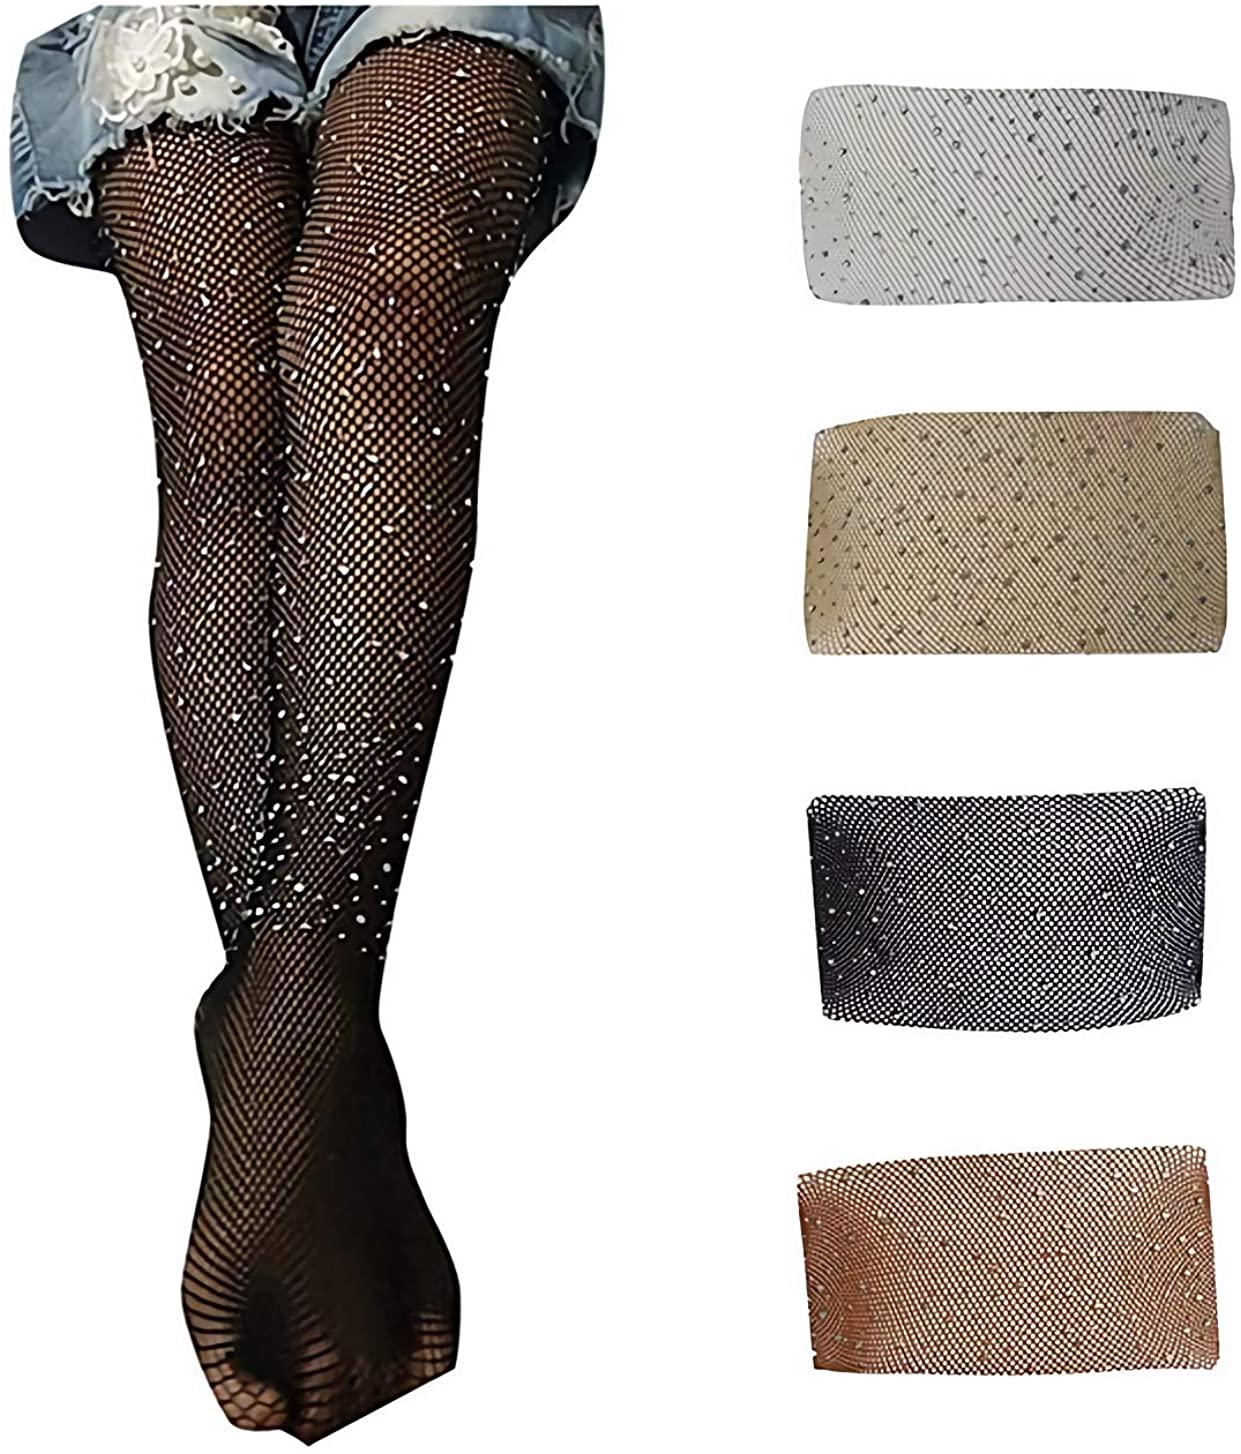 Napoo-Baby clothes Kid Girl Mesh Fishnet Rhinestone Pantyhose Flash Tights Shining Stockings